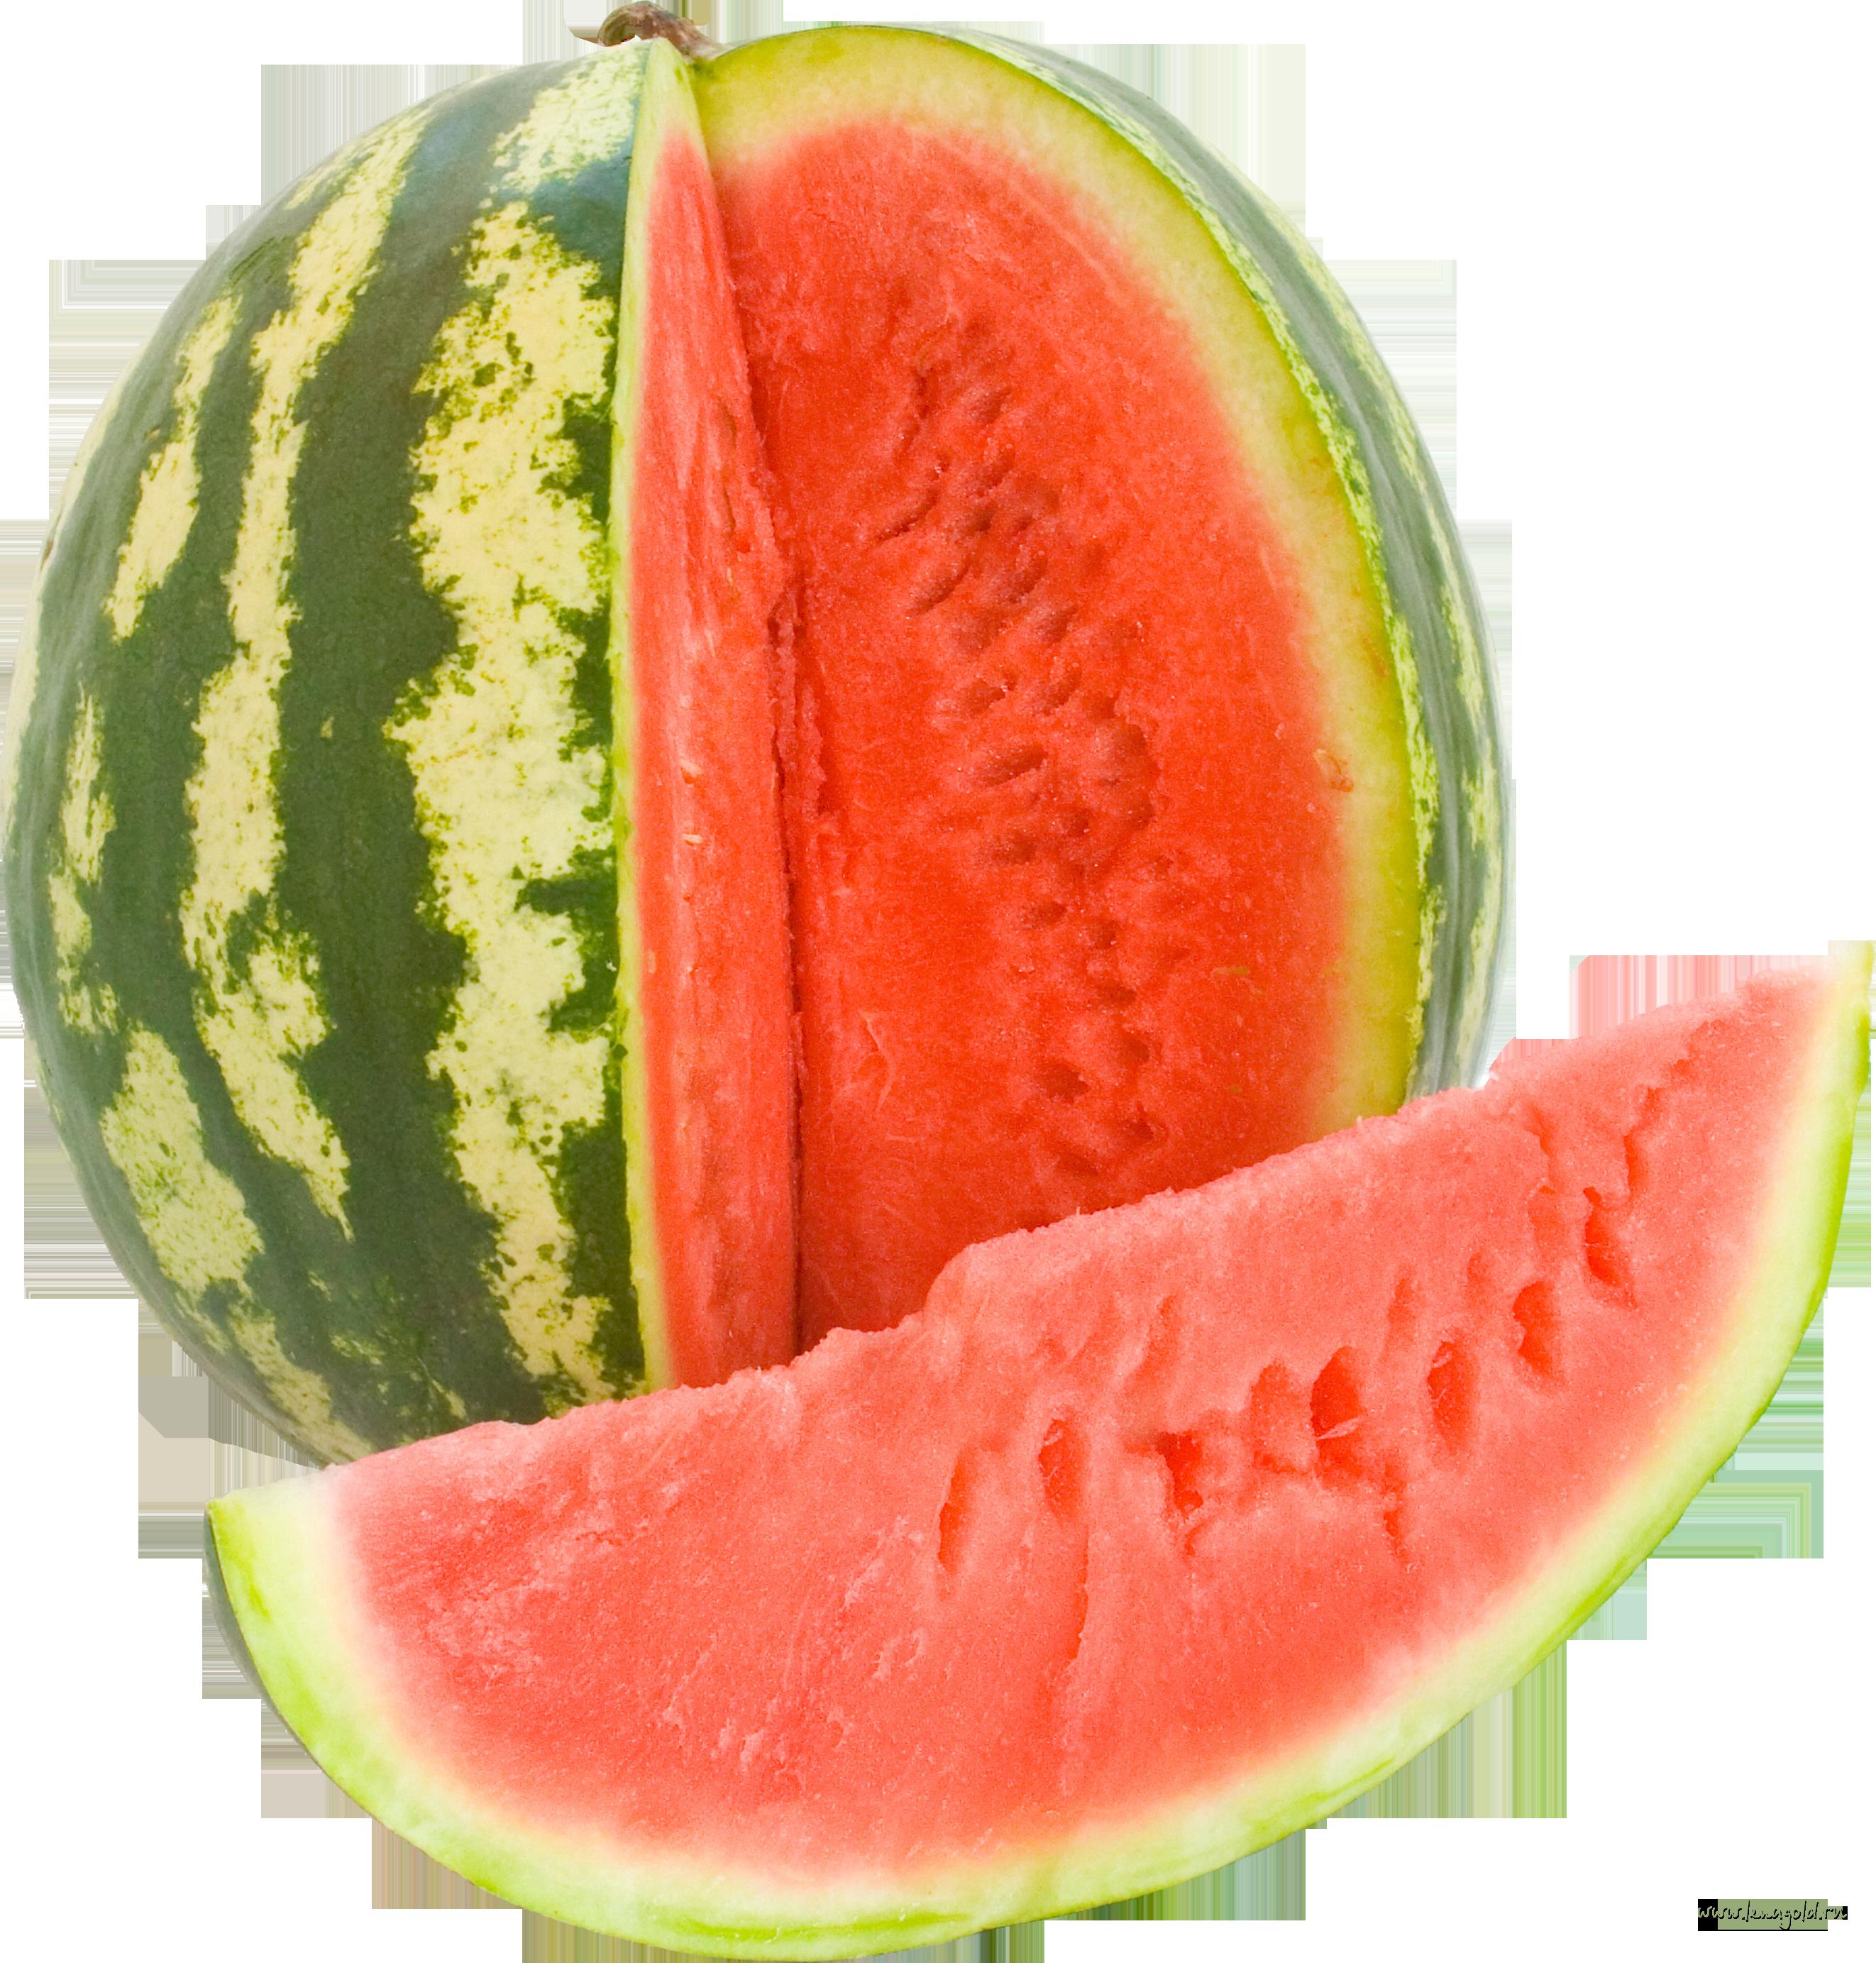 Png Picture Of Watermelon Watermelon Watermelon Images Orange Juice Benefits